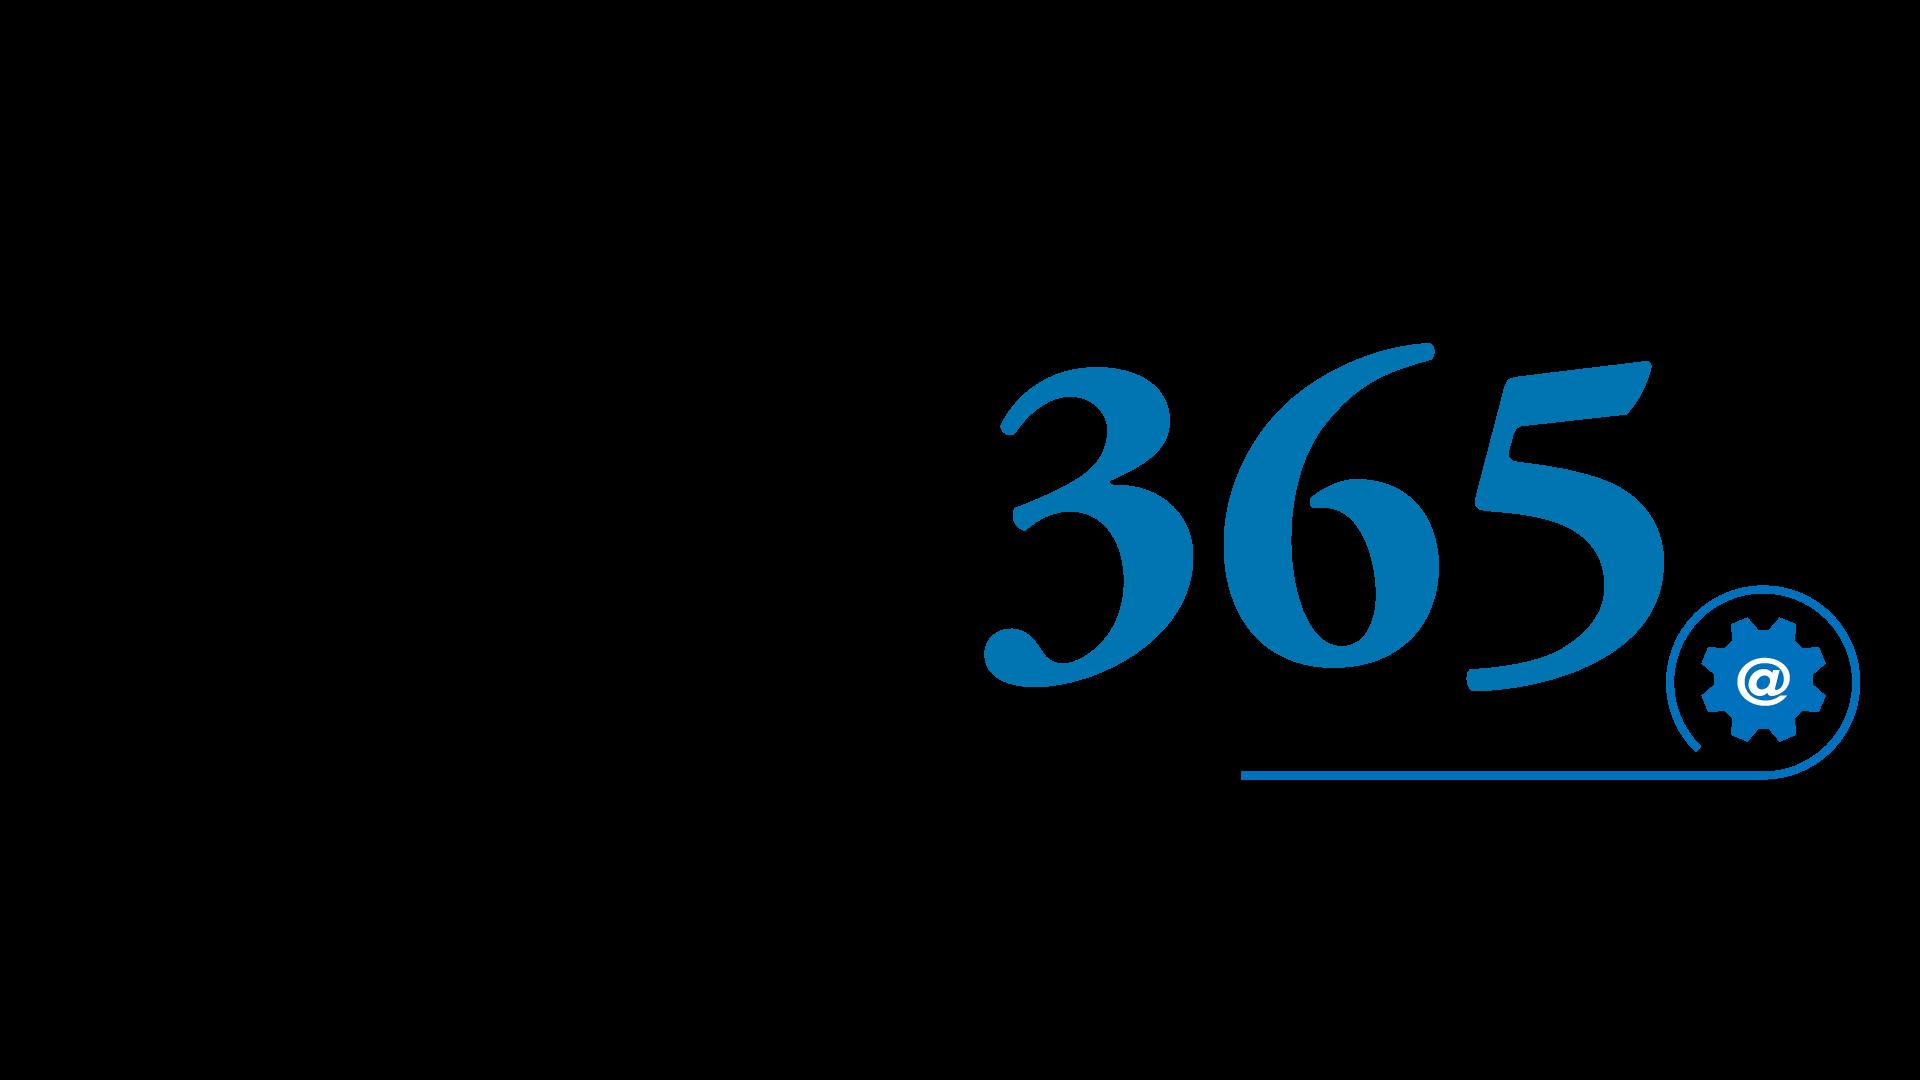 eblast 365 email marketing planning system